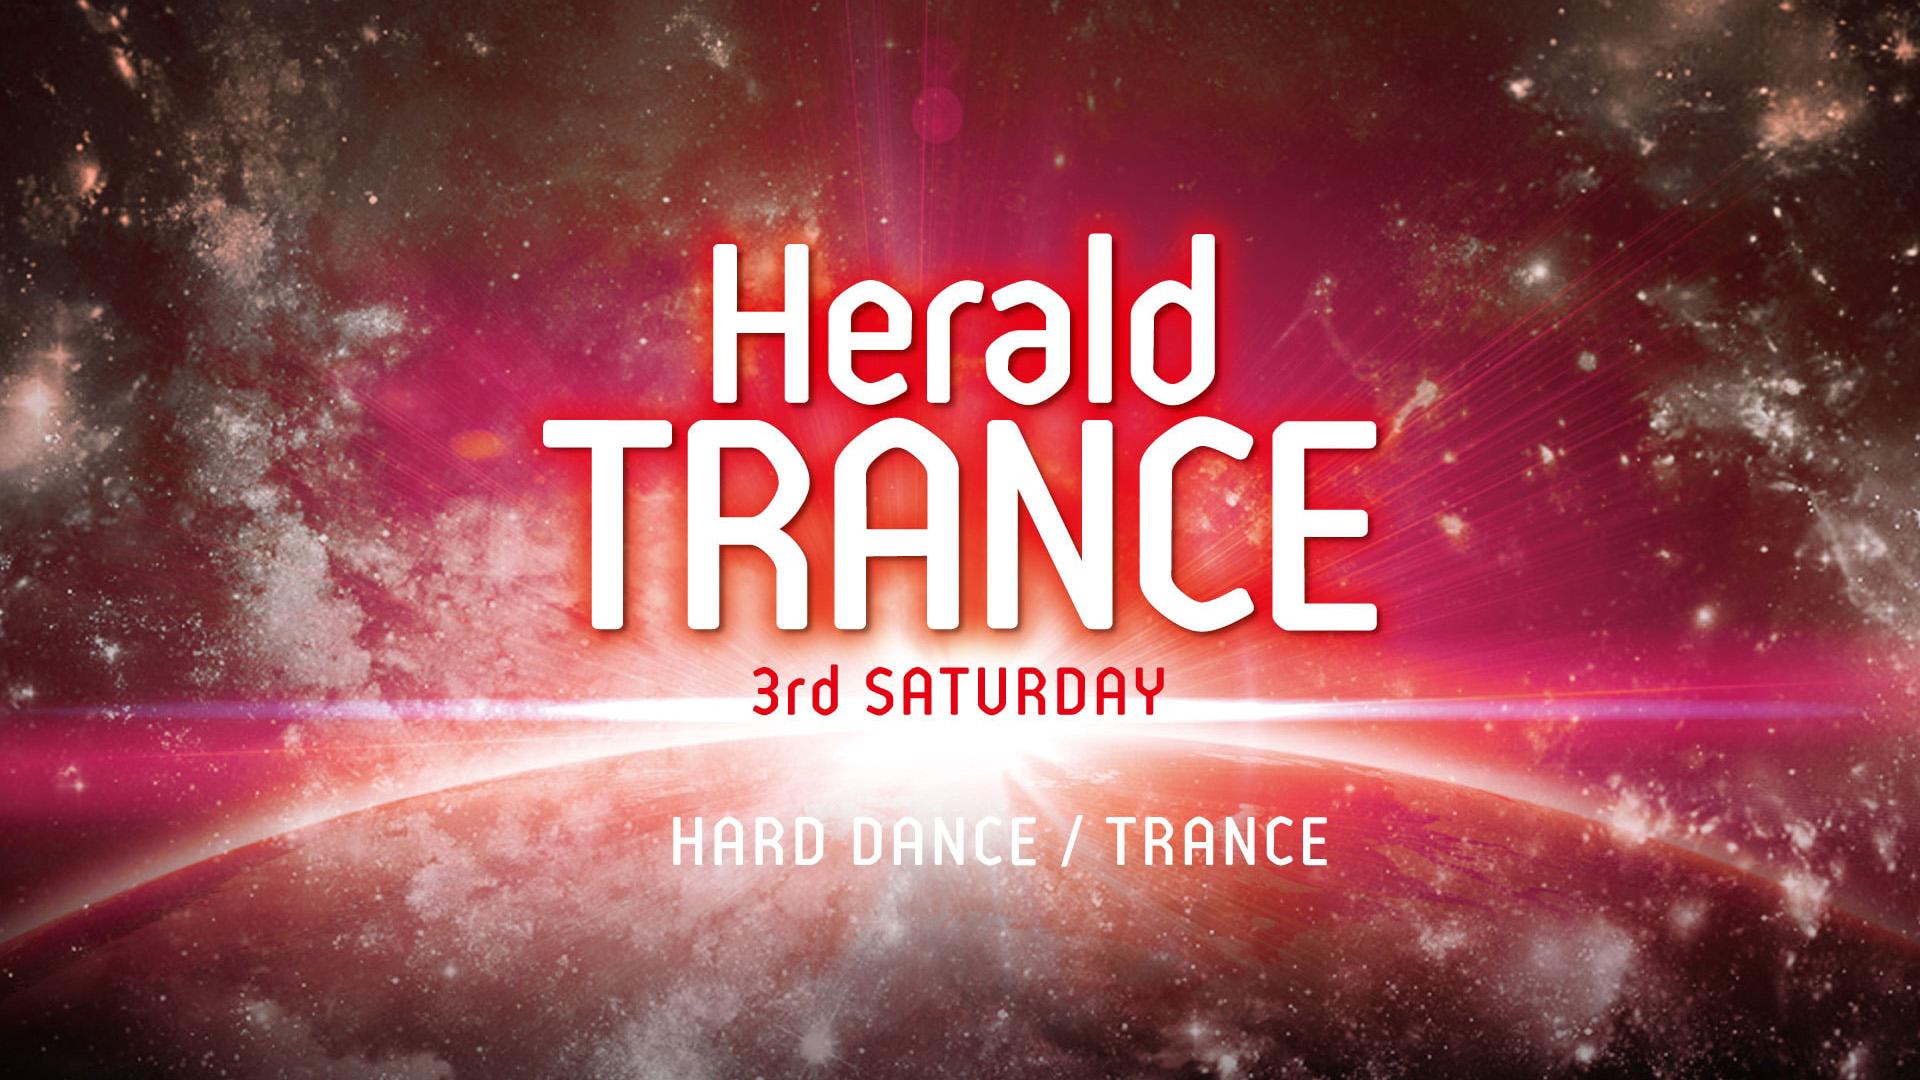 HERALD TRANCE